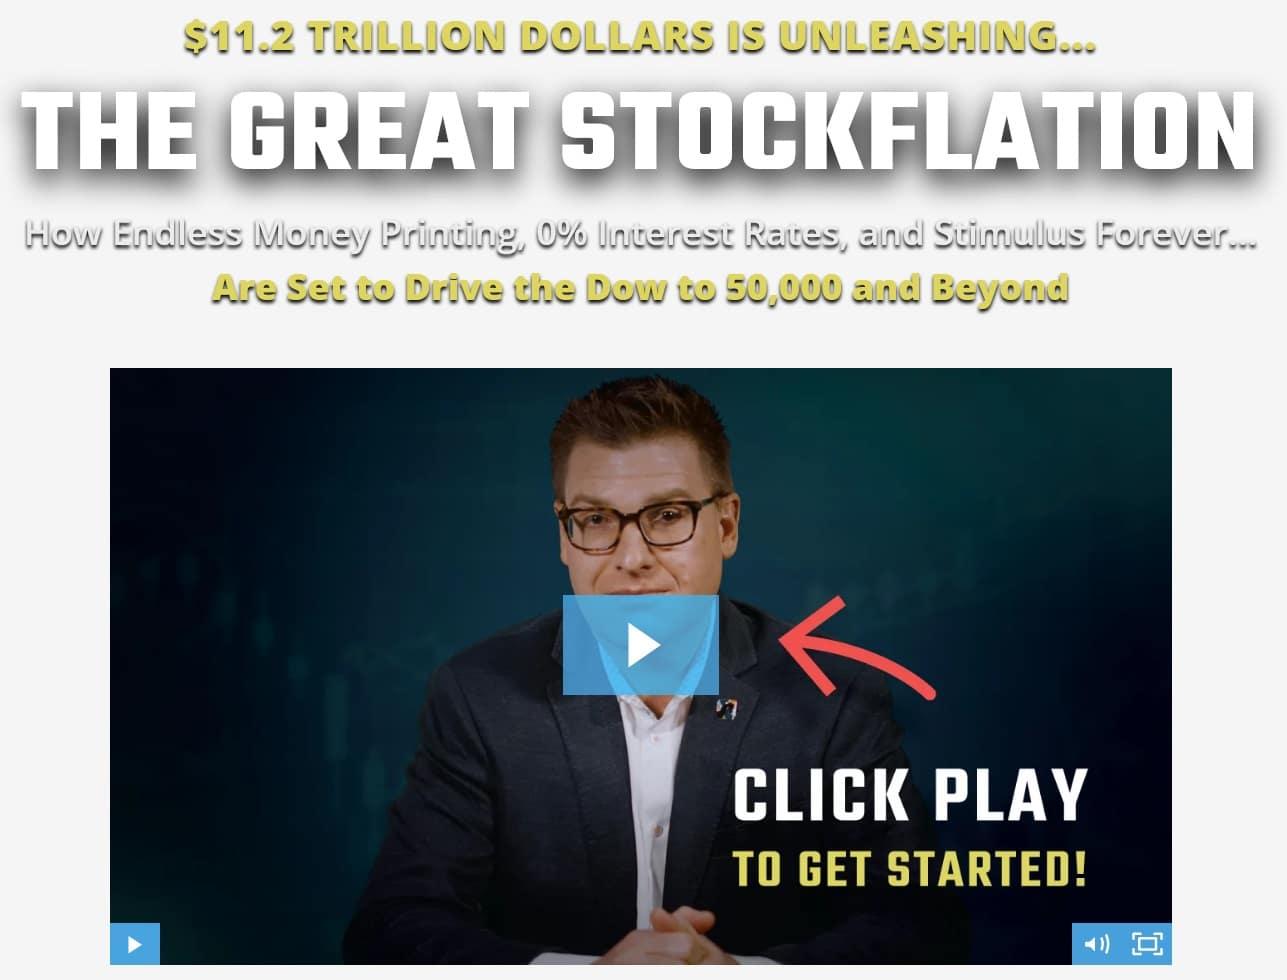 Bryan Bottarelli's Stockflation